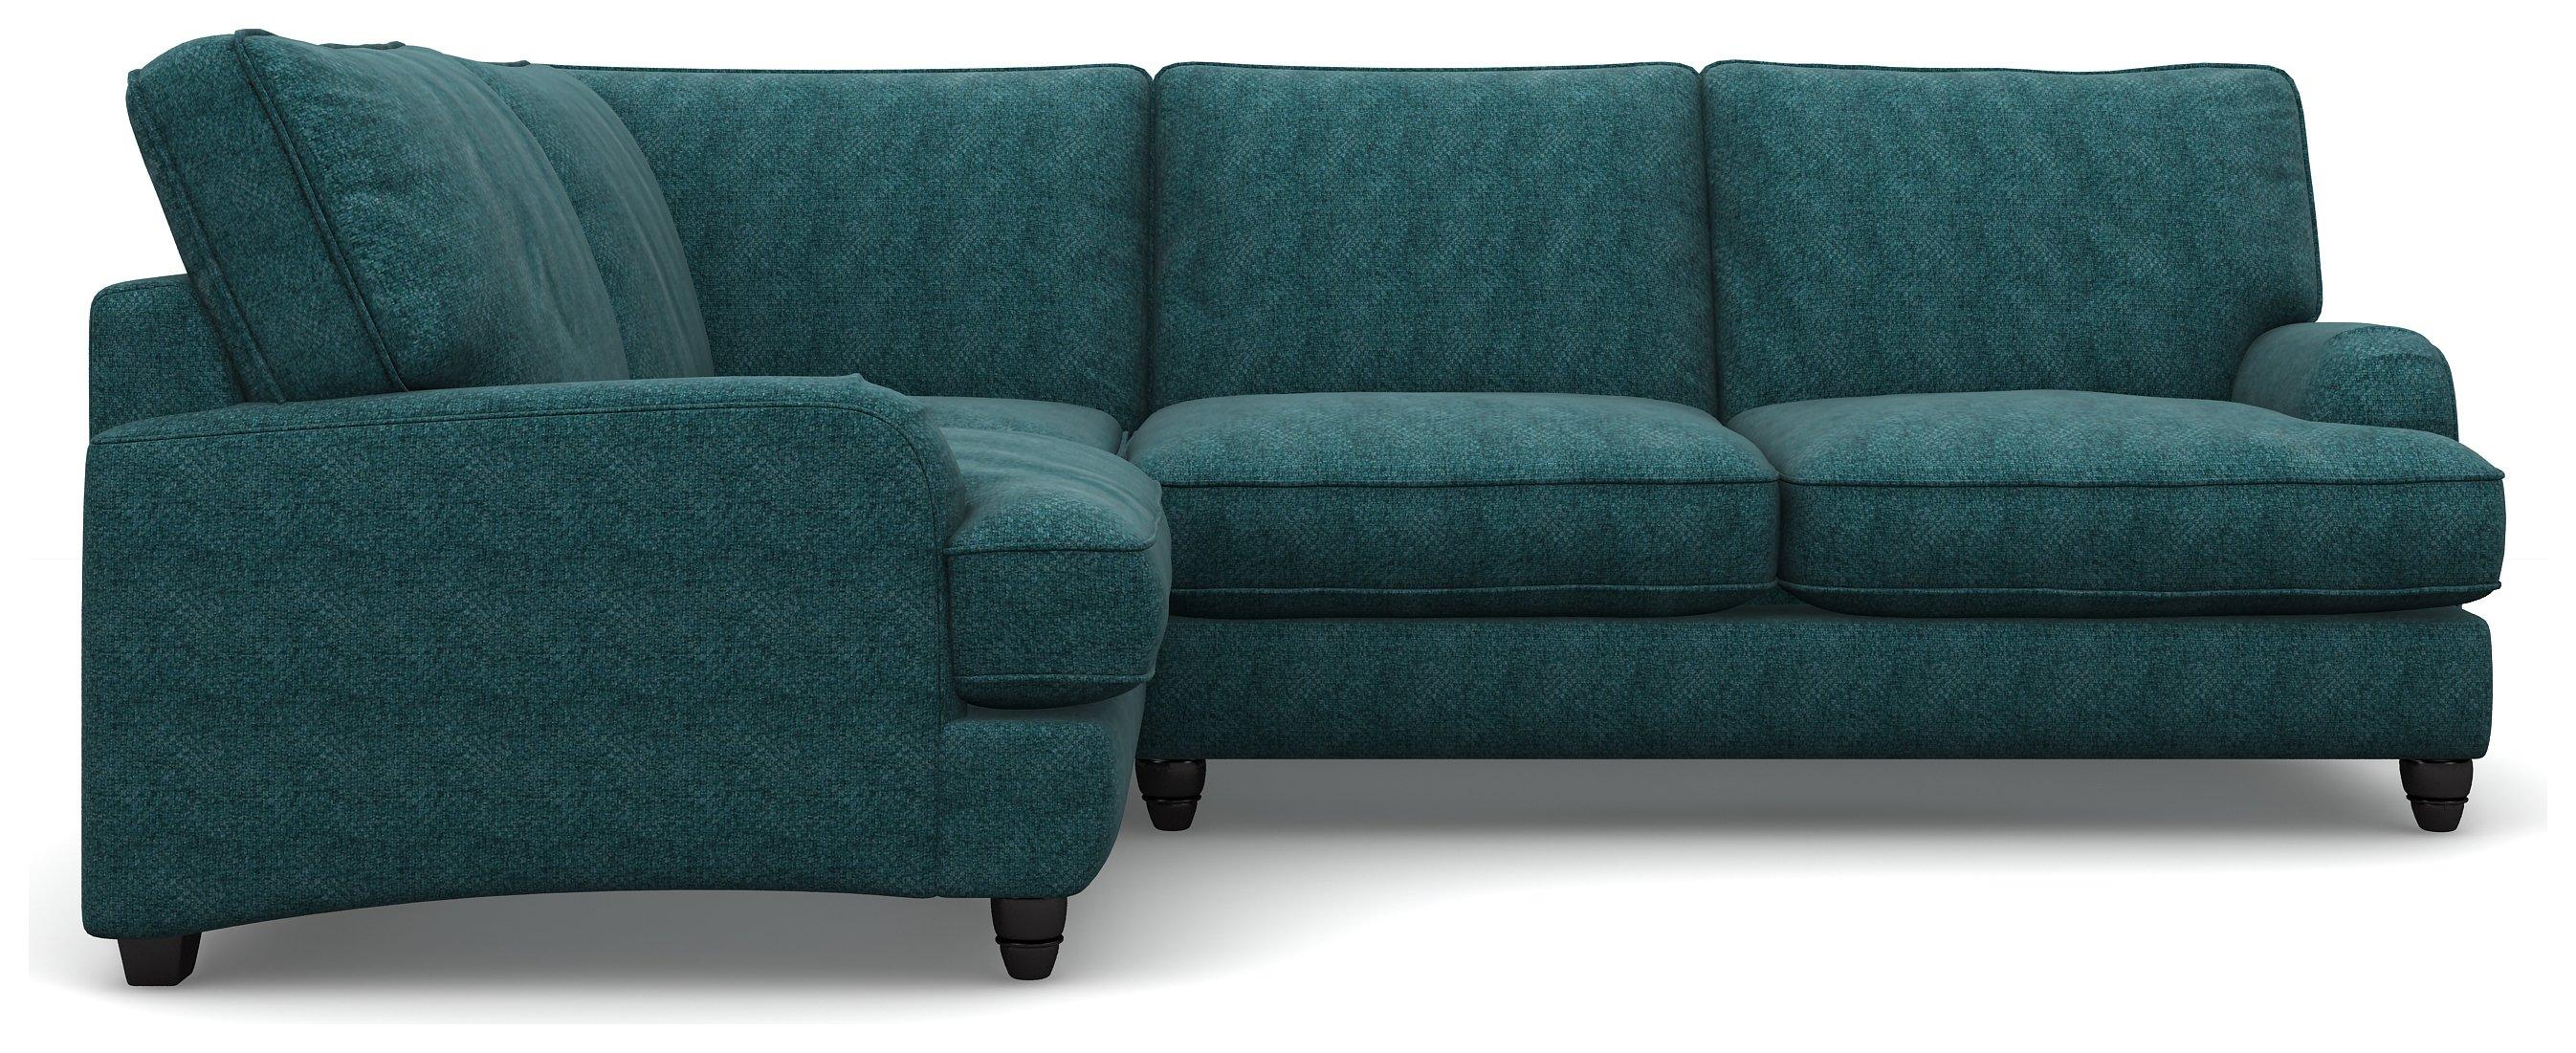 Heart of House Adeline Comfort Fabric LH Corner Sofa - Teal